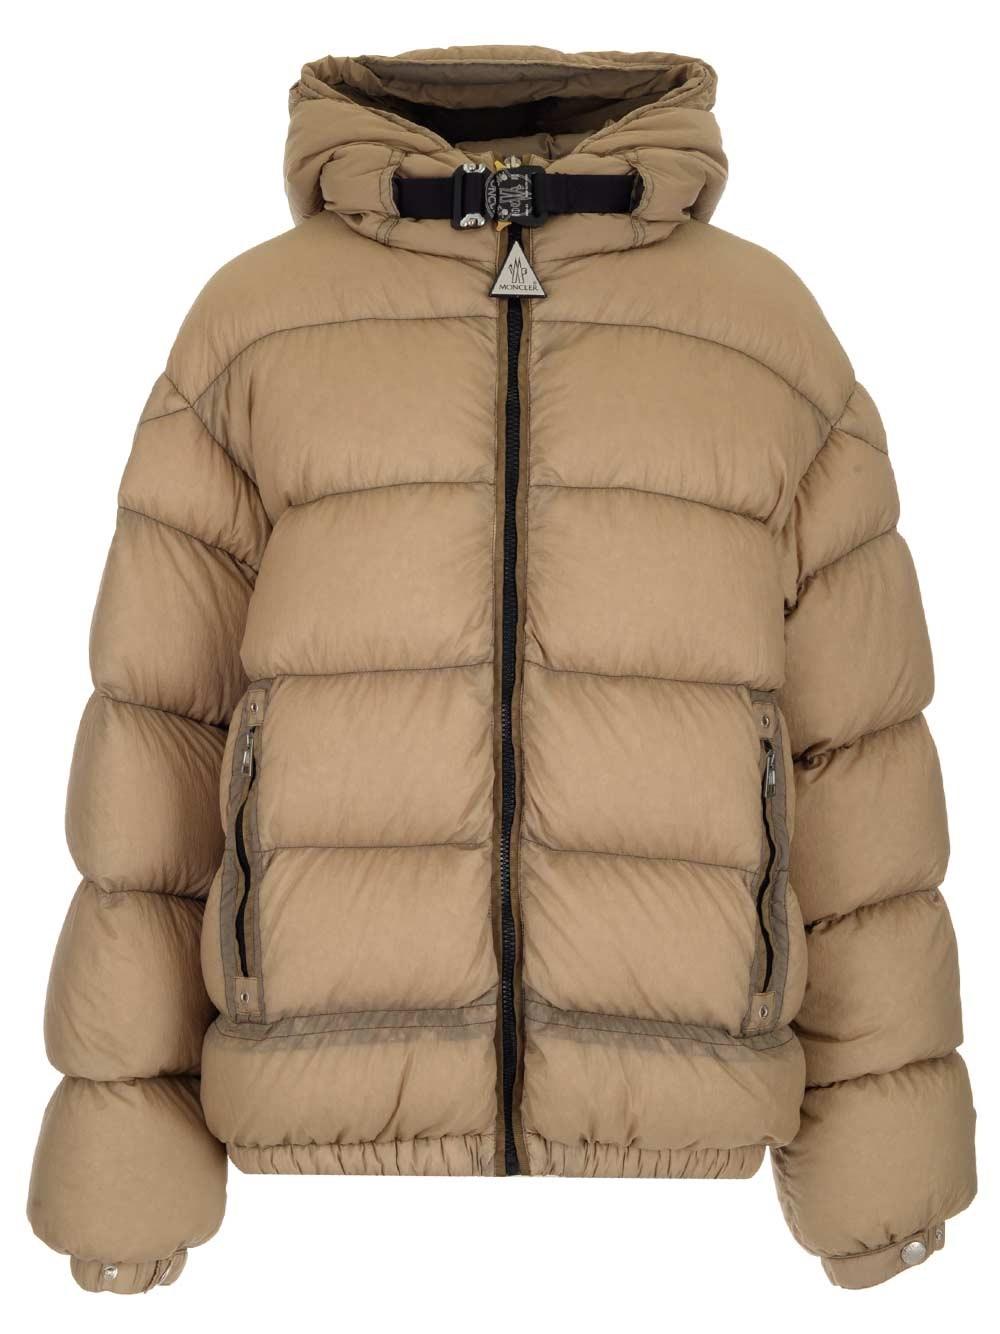 "MONCLER GENIUS ""Almond"" Jacket 6 Moncler 1017 Alyx 9Sm"